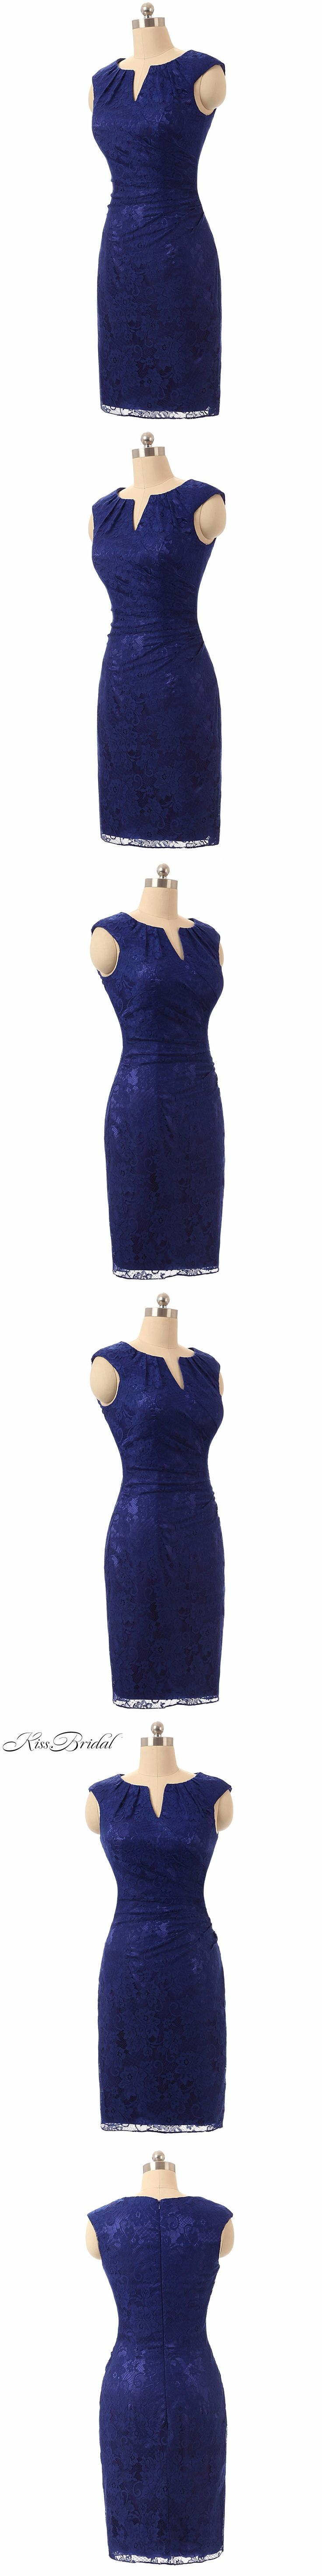 dress robe cocktail